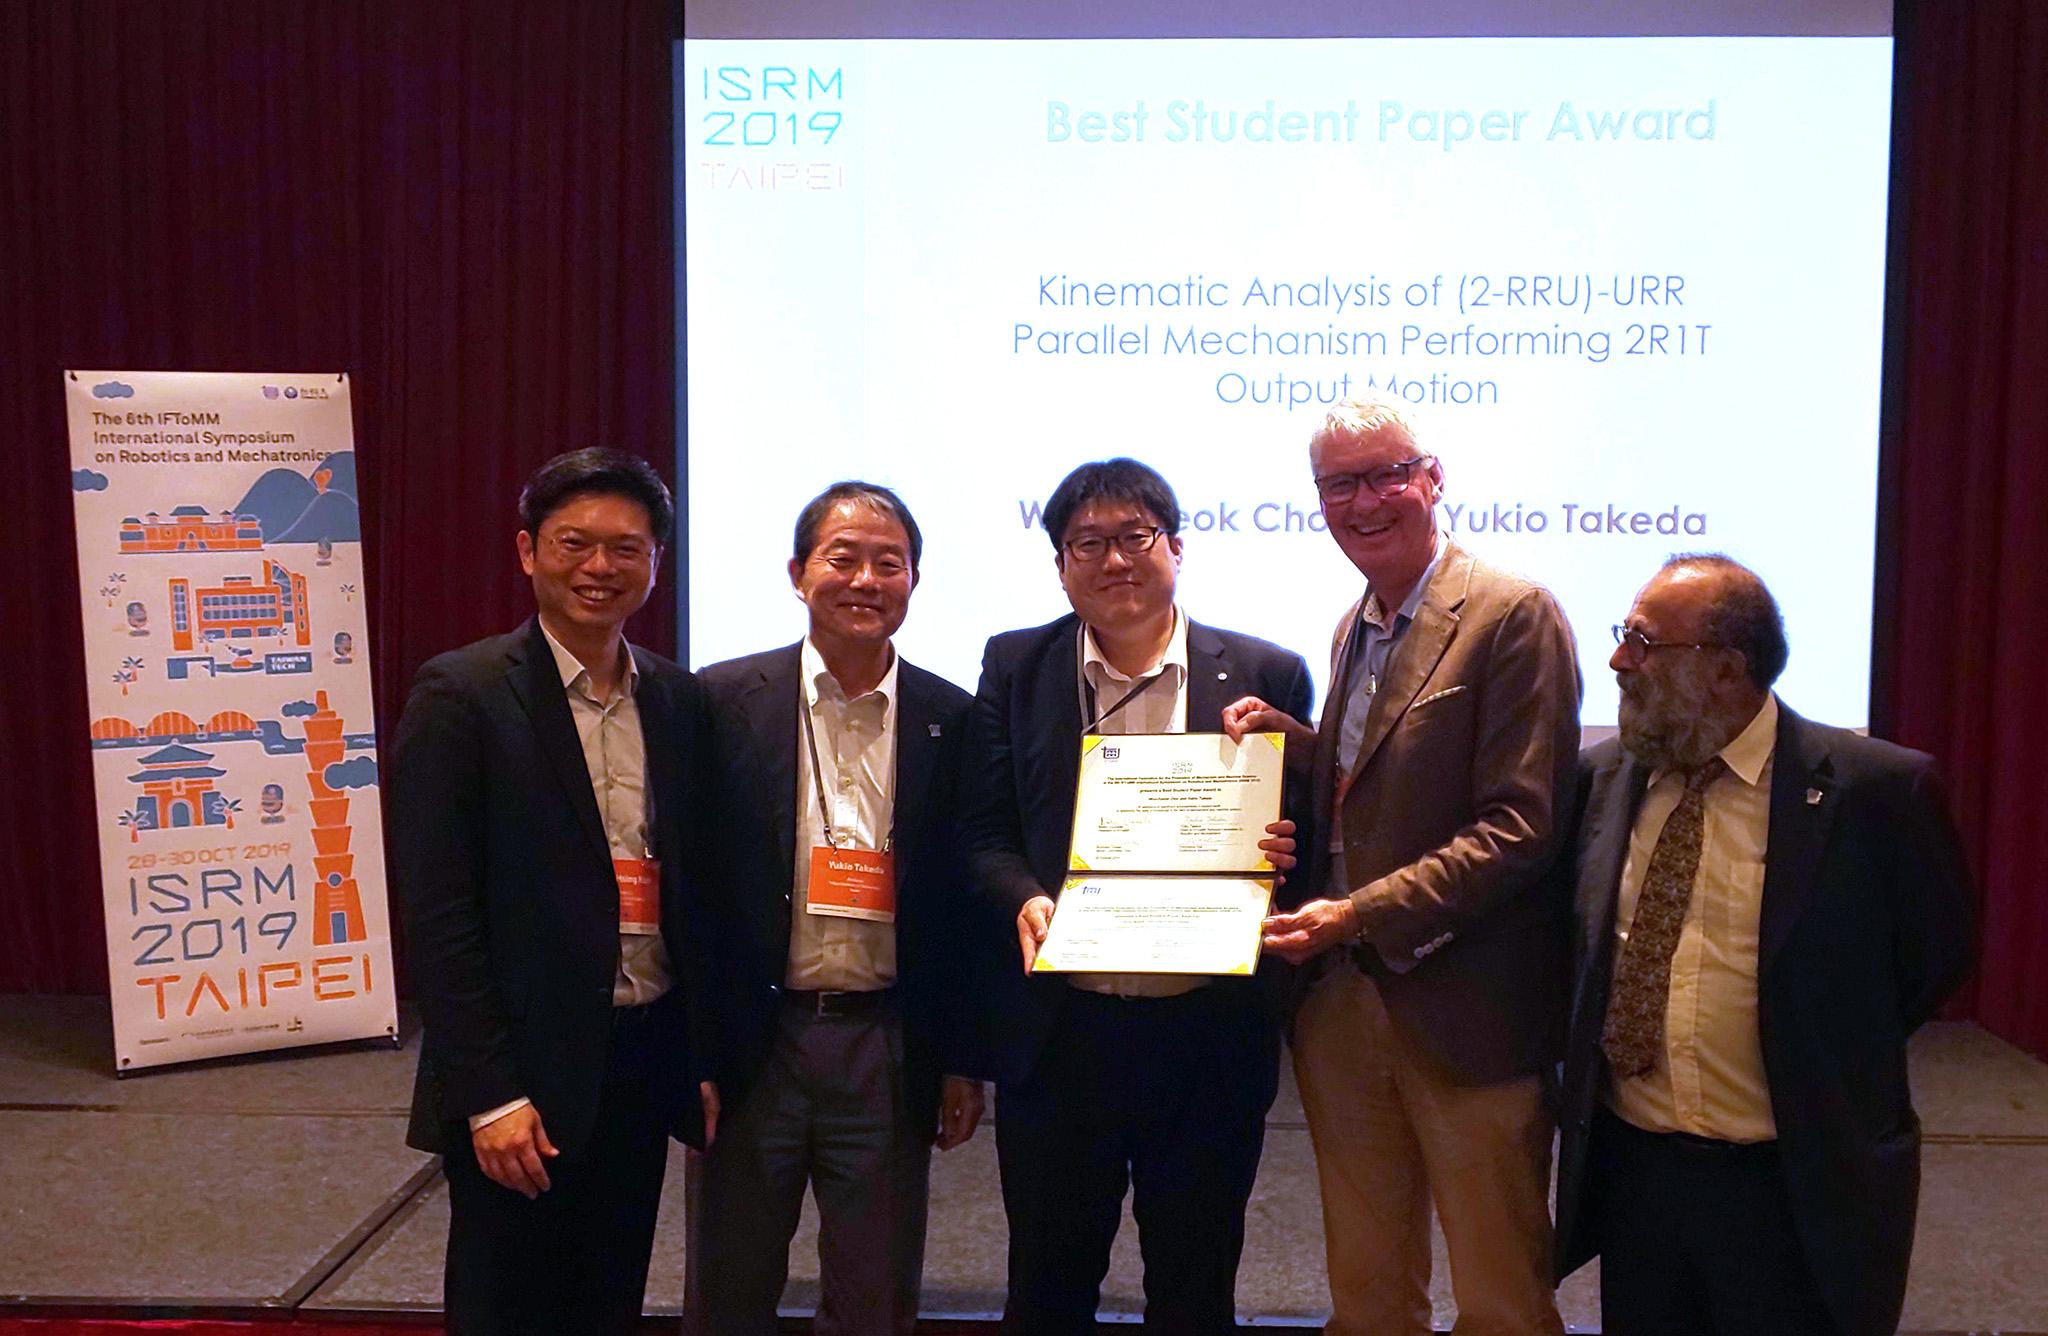 Choi Woohyeok won the BP award at ISRM2019